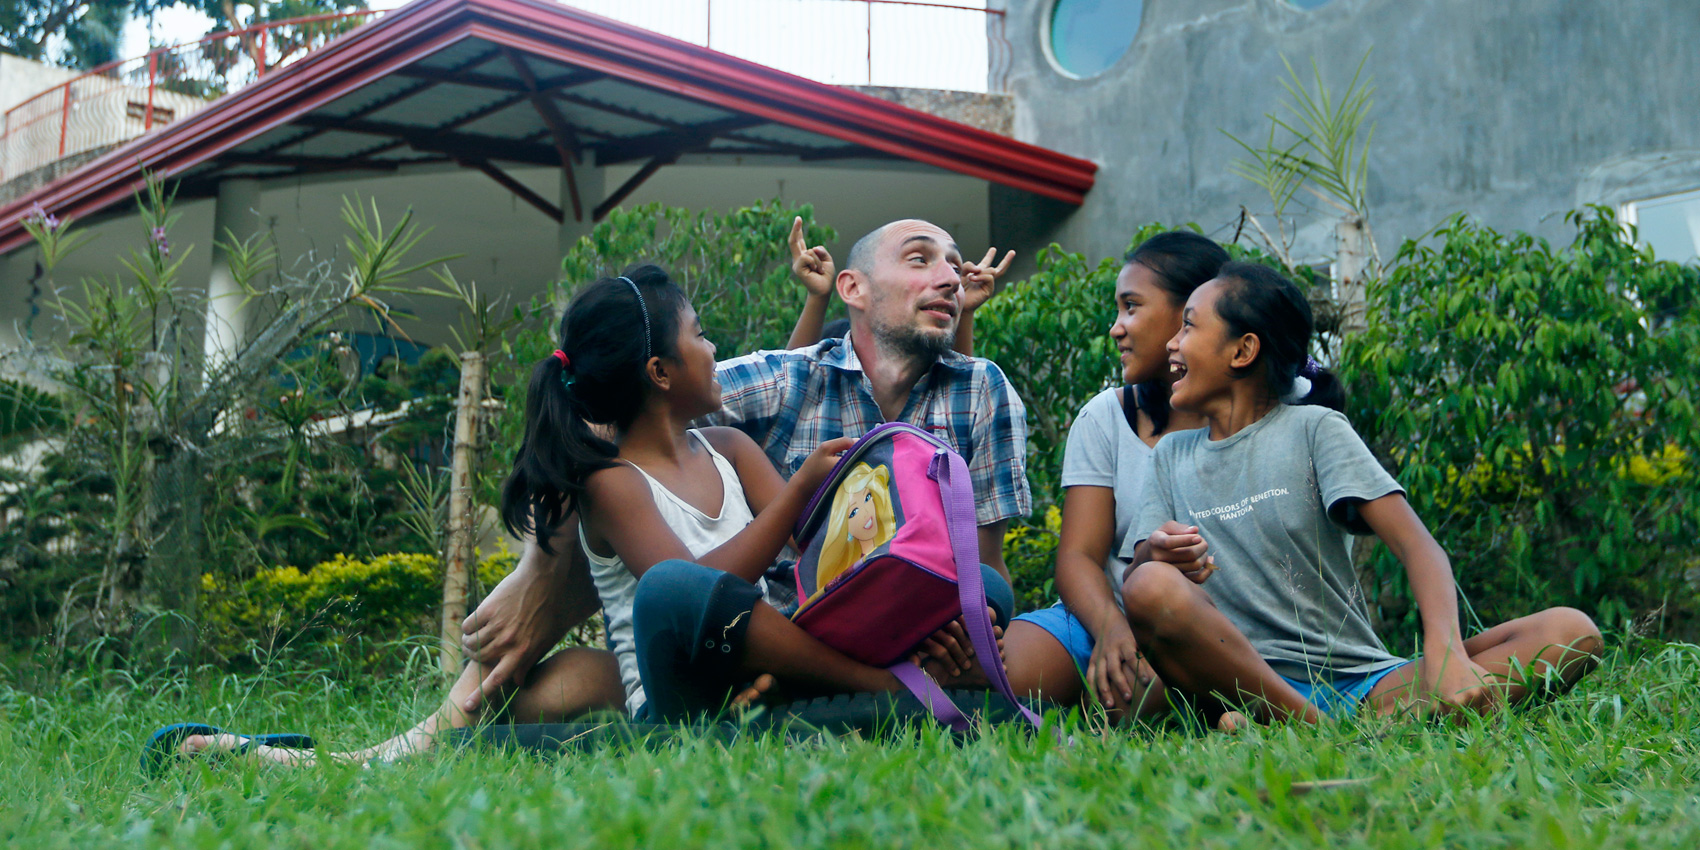 Diventa volontario di Isla ng Bata